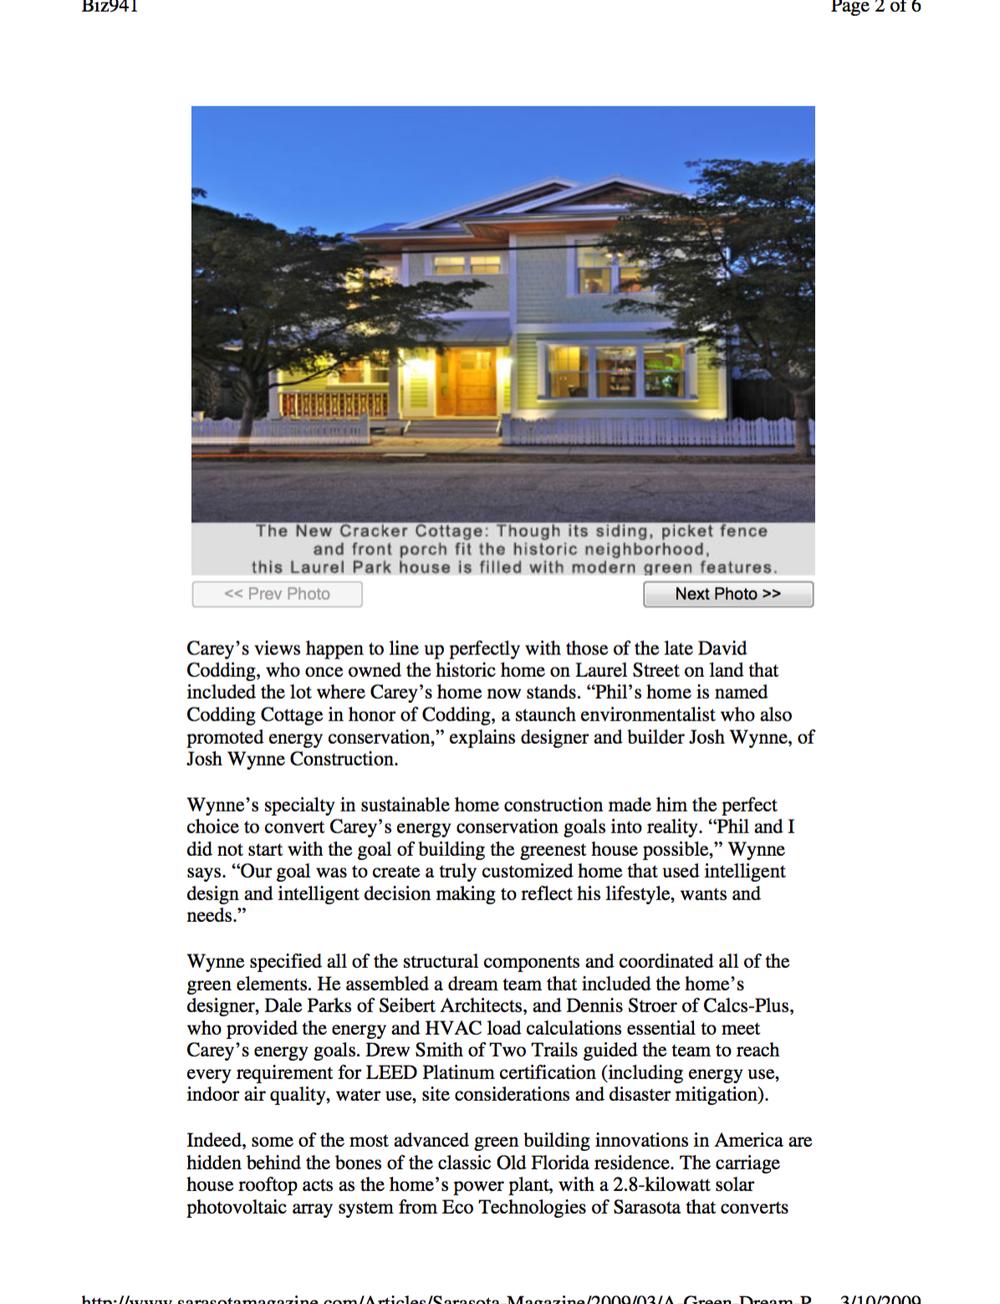 sarasota-magazine-green-dream_pdf 2.png